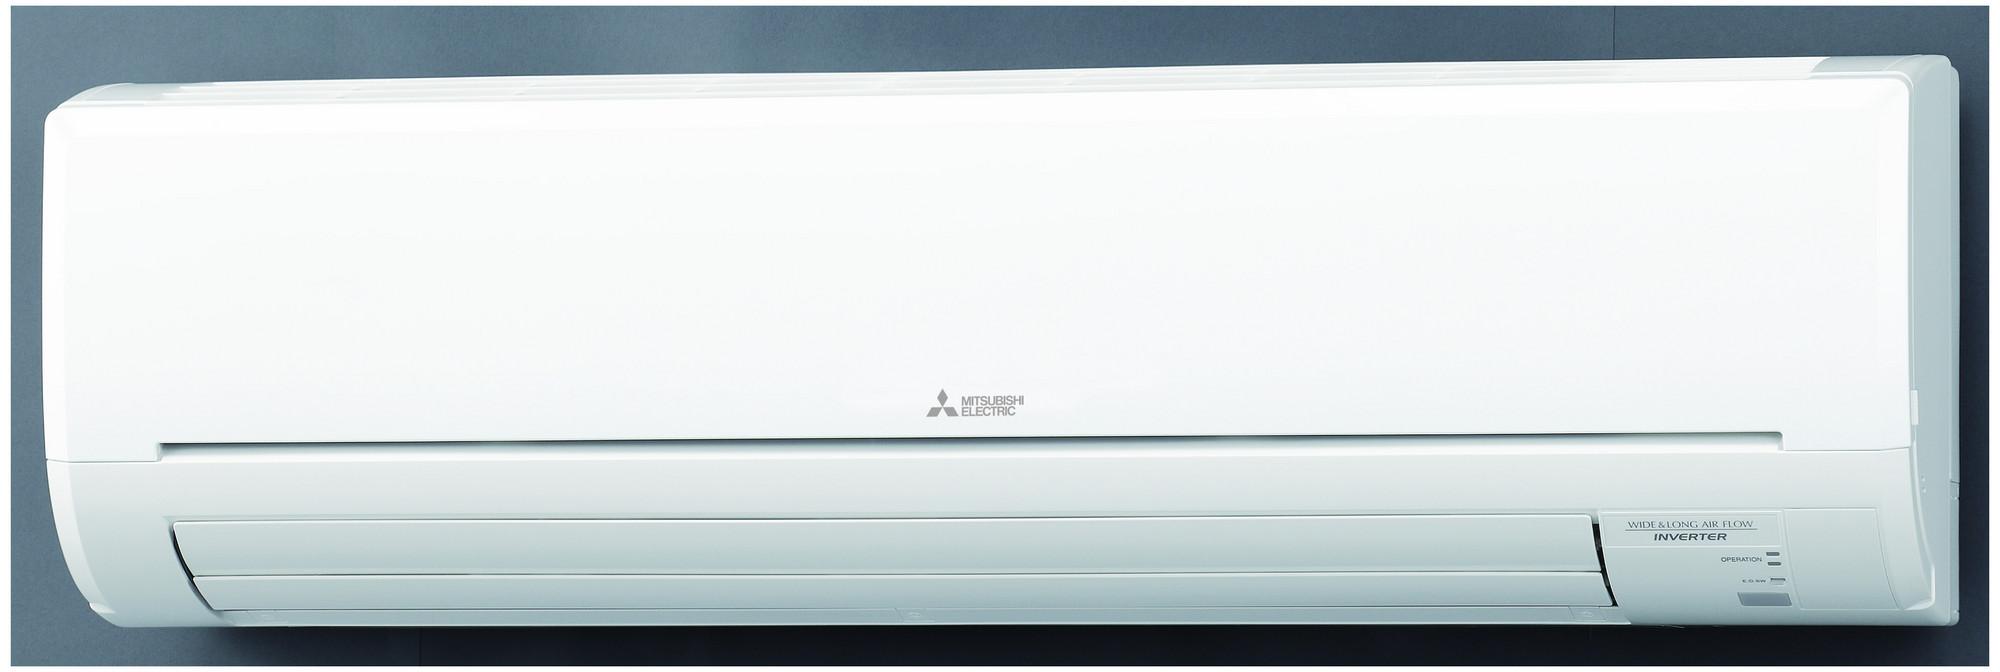 Climatiseur Mitsubishi monosplit réversible inverter MSZ-GF60VE2.